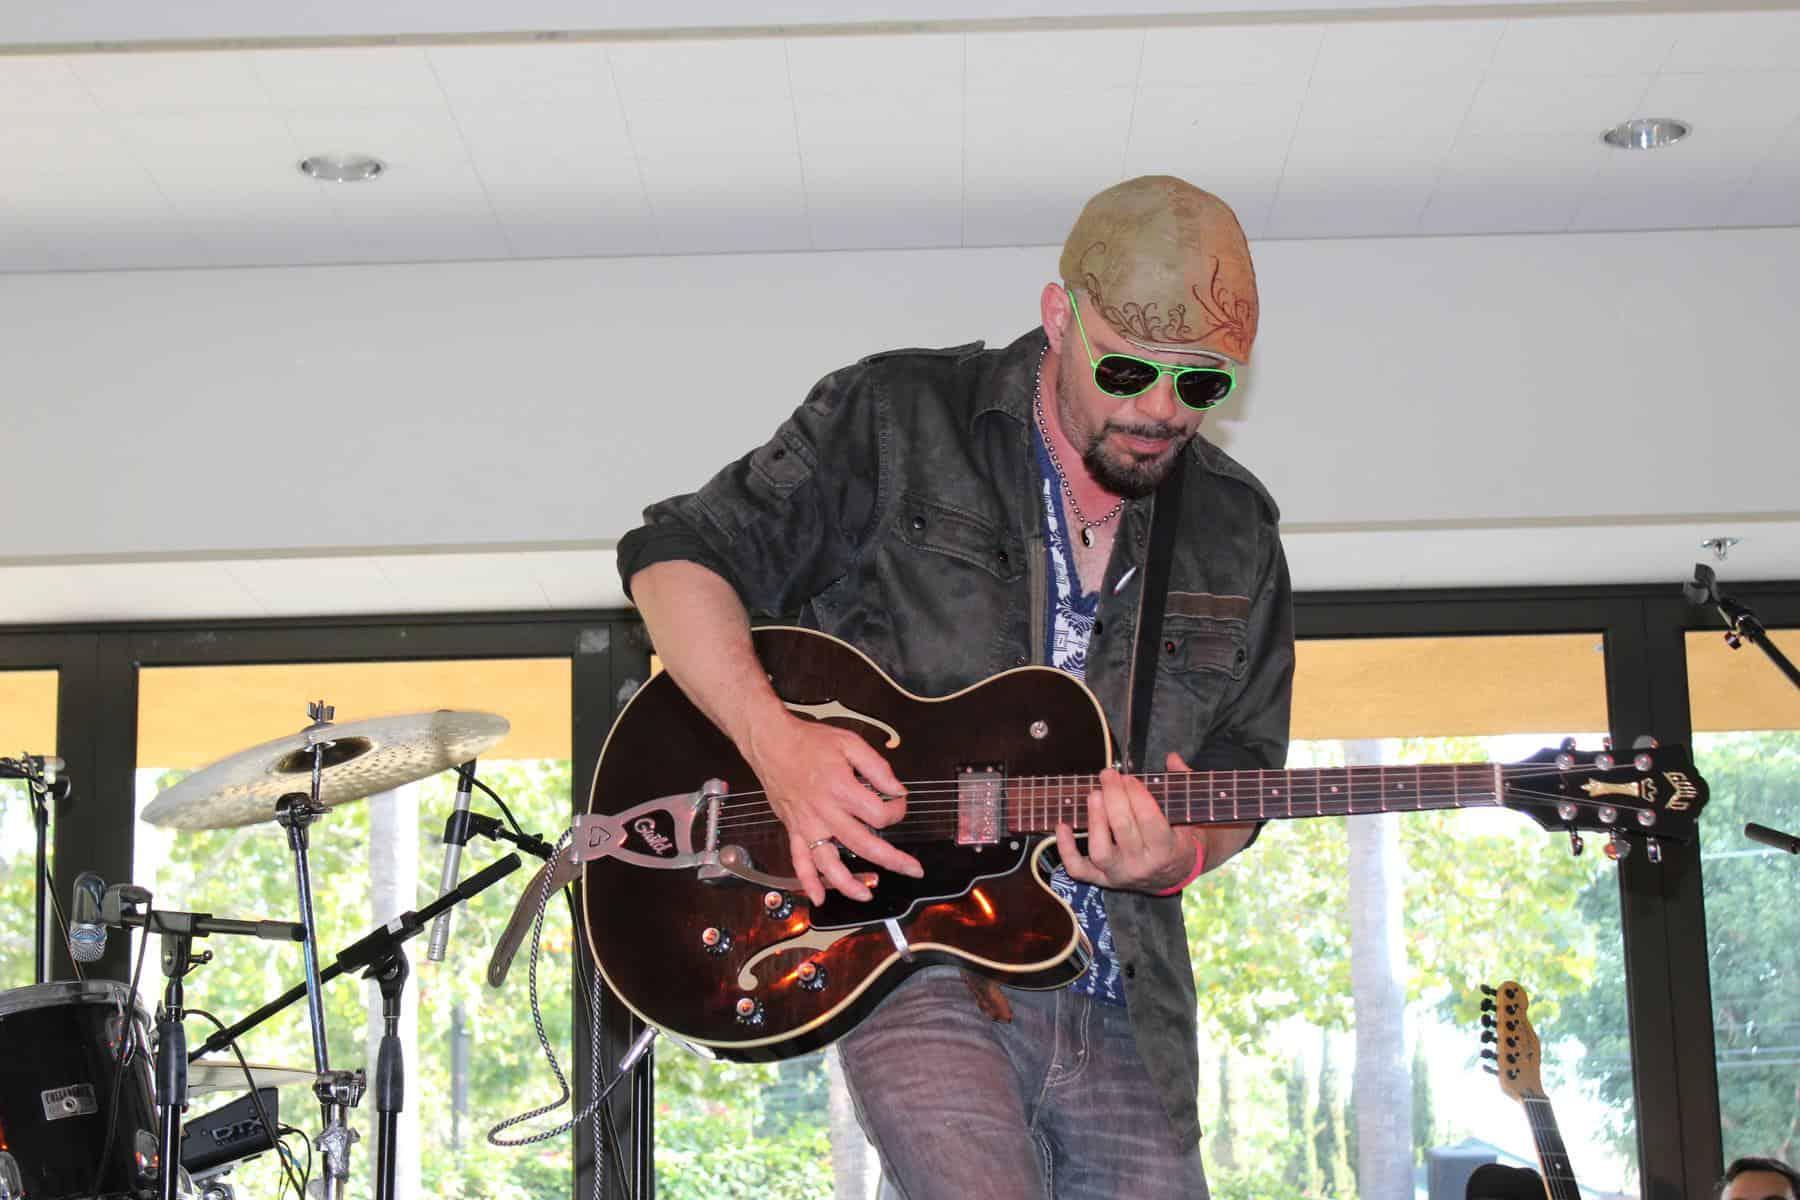 Guitarist with sunglasses